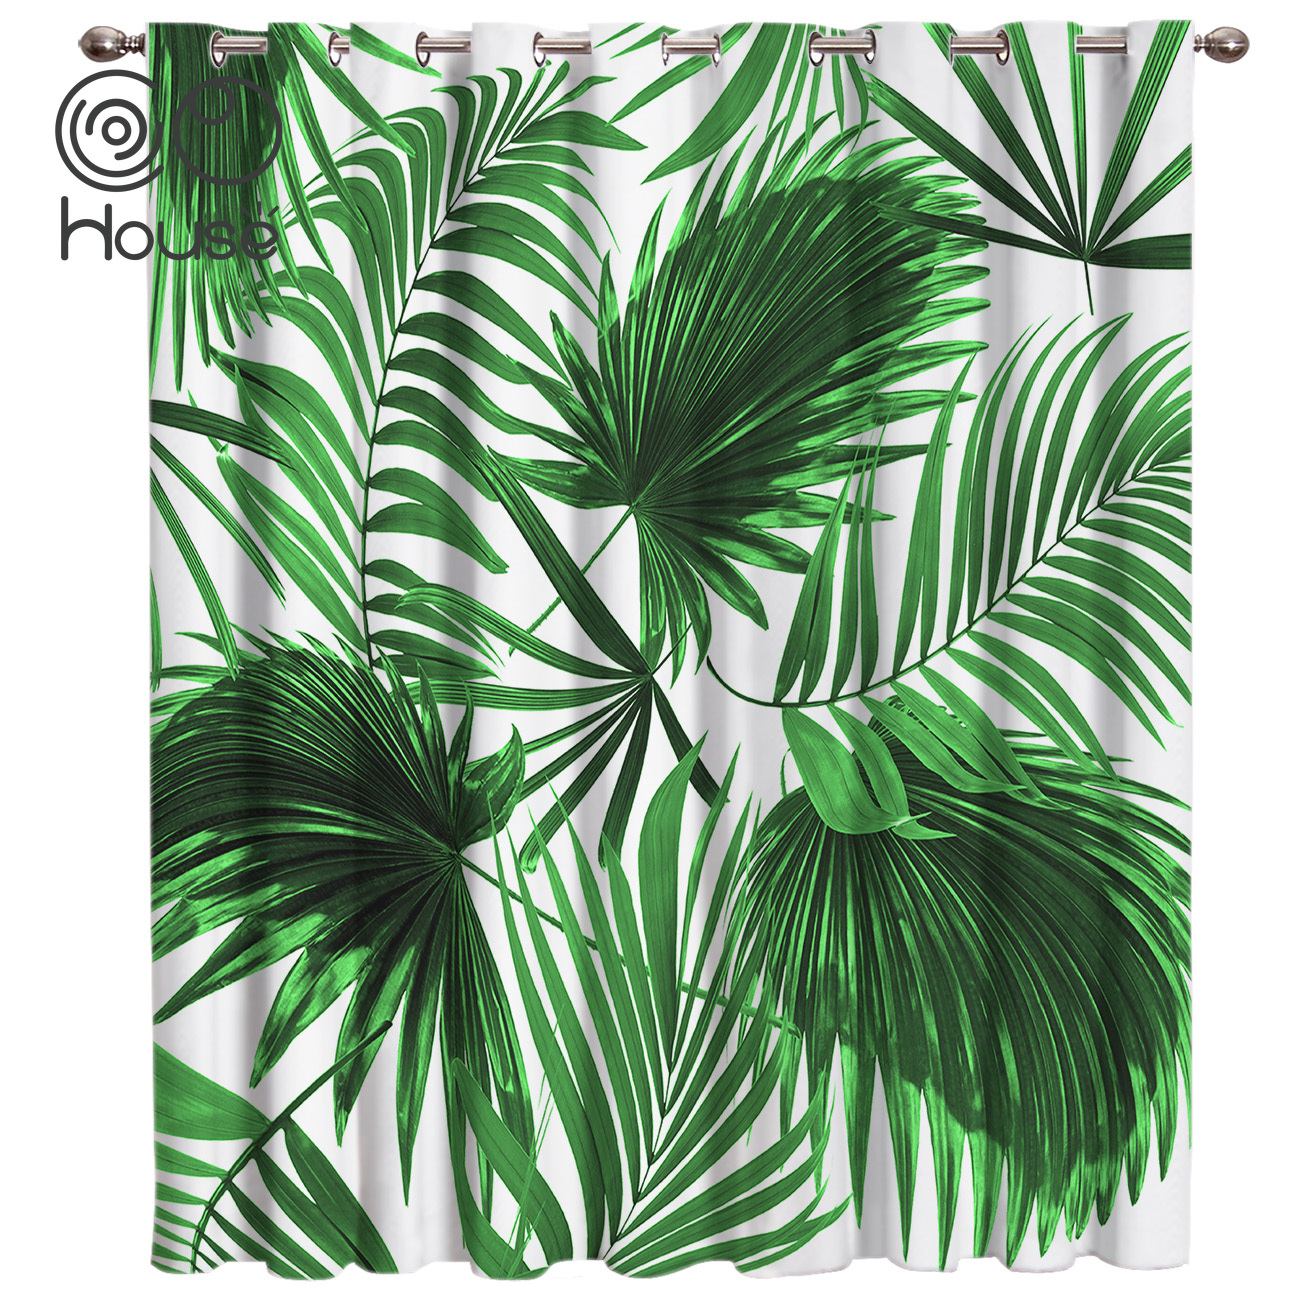 Plant Green Palm Leaf Window Treatments Curtains Valance Living Room Blackout Bathroom Fabric Decor Kids Curtain